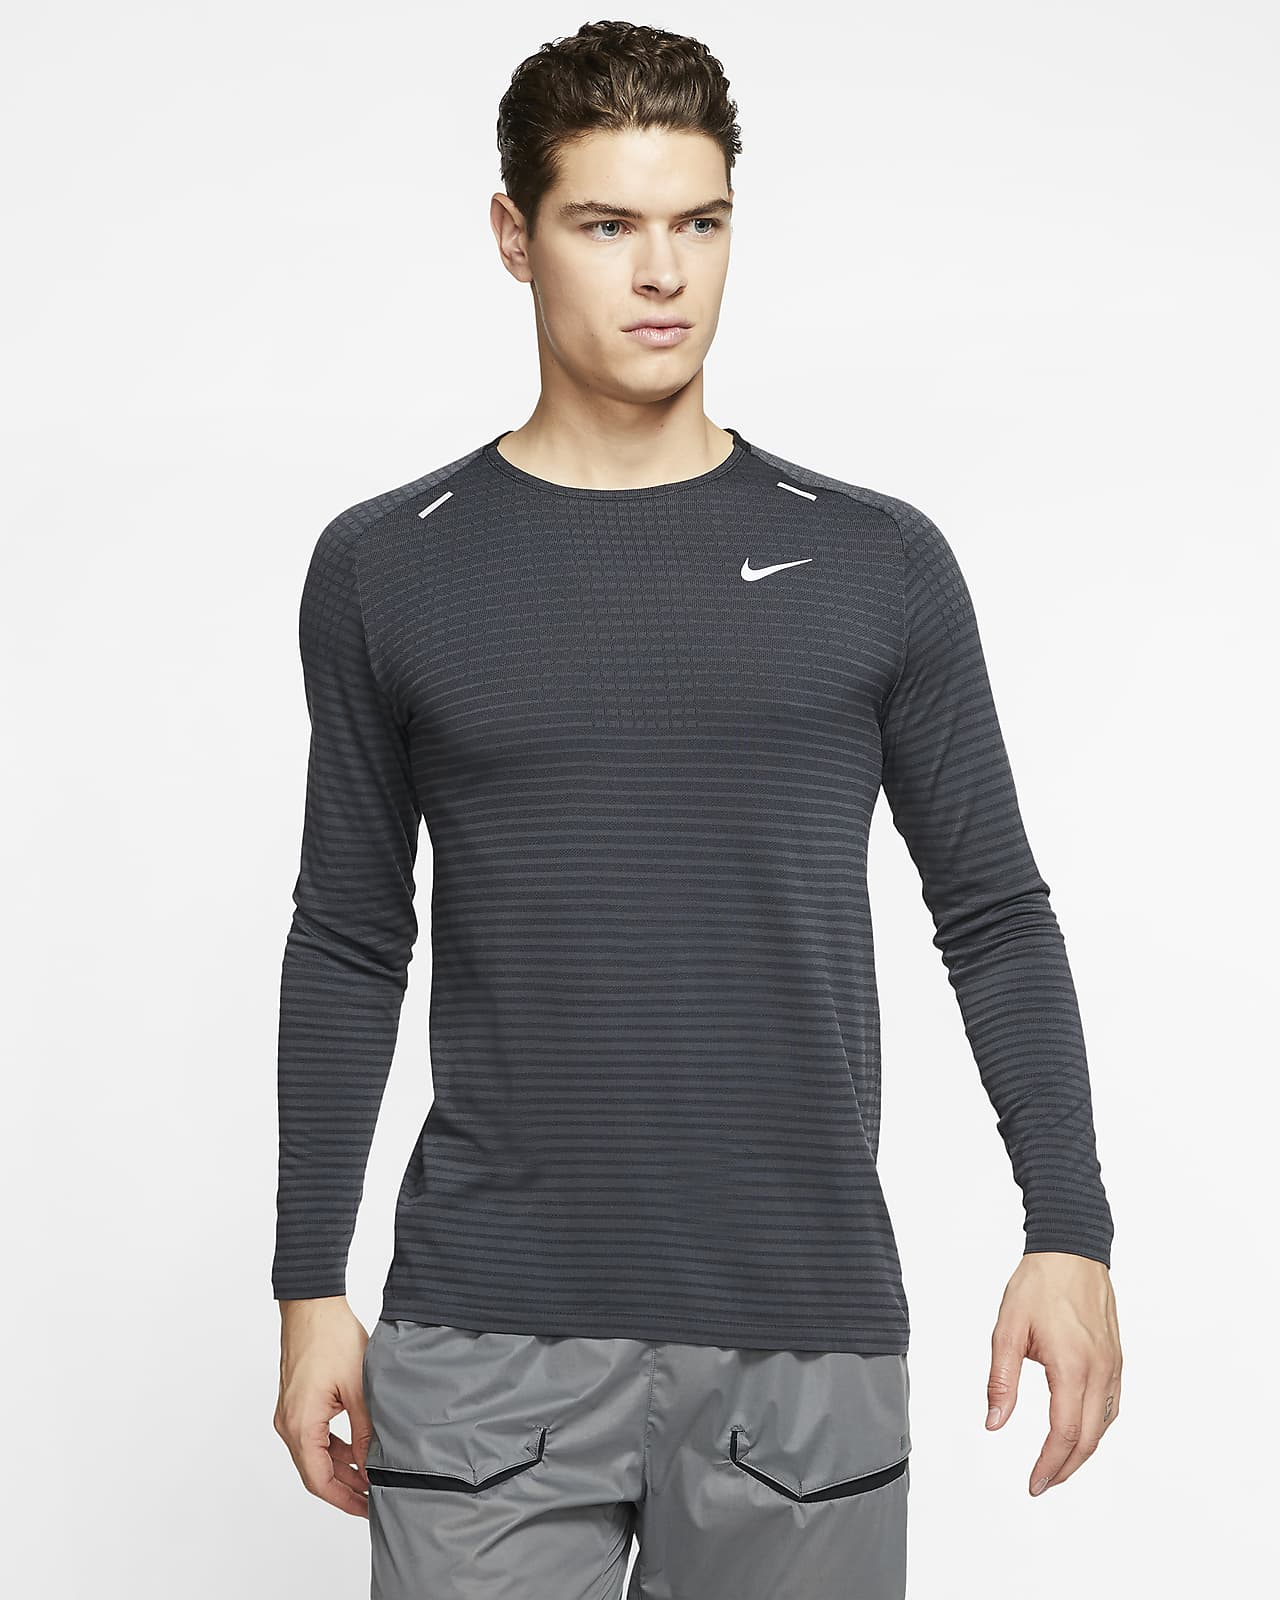 chisme Histérico muñeca  Nike TechKnit Ultra Camiseta de running de manga larga - Hombre. Nike ES